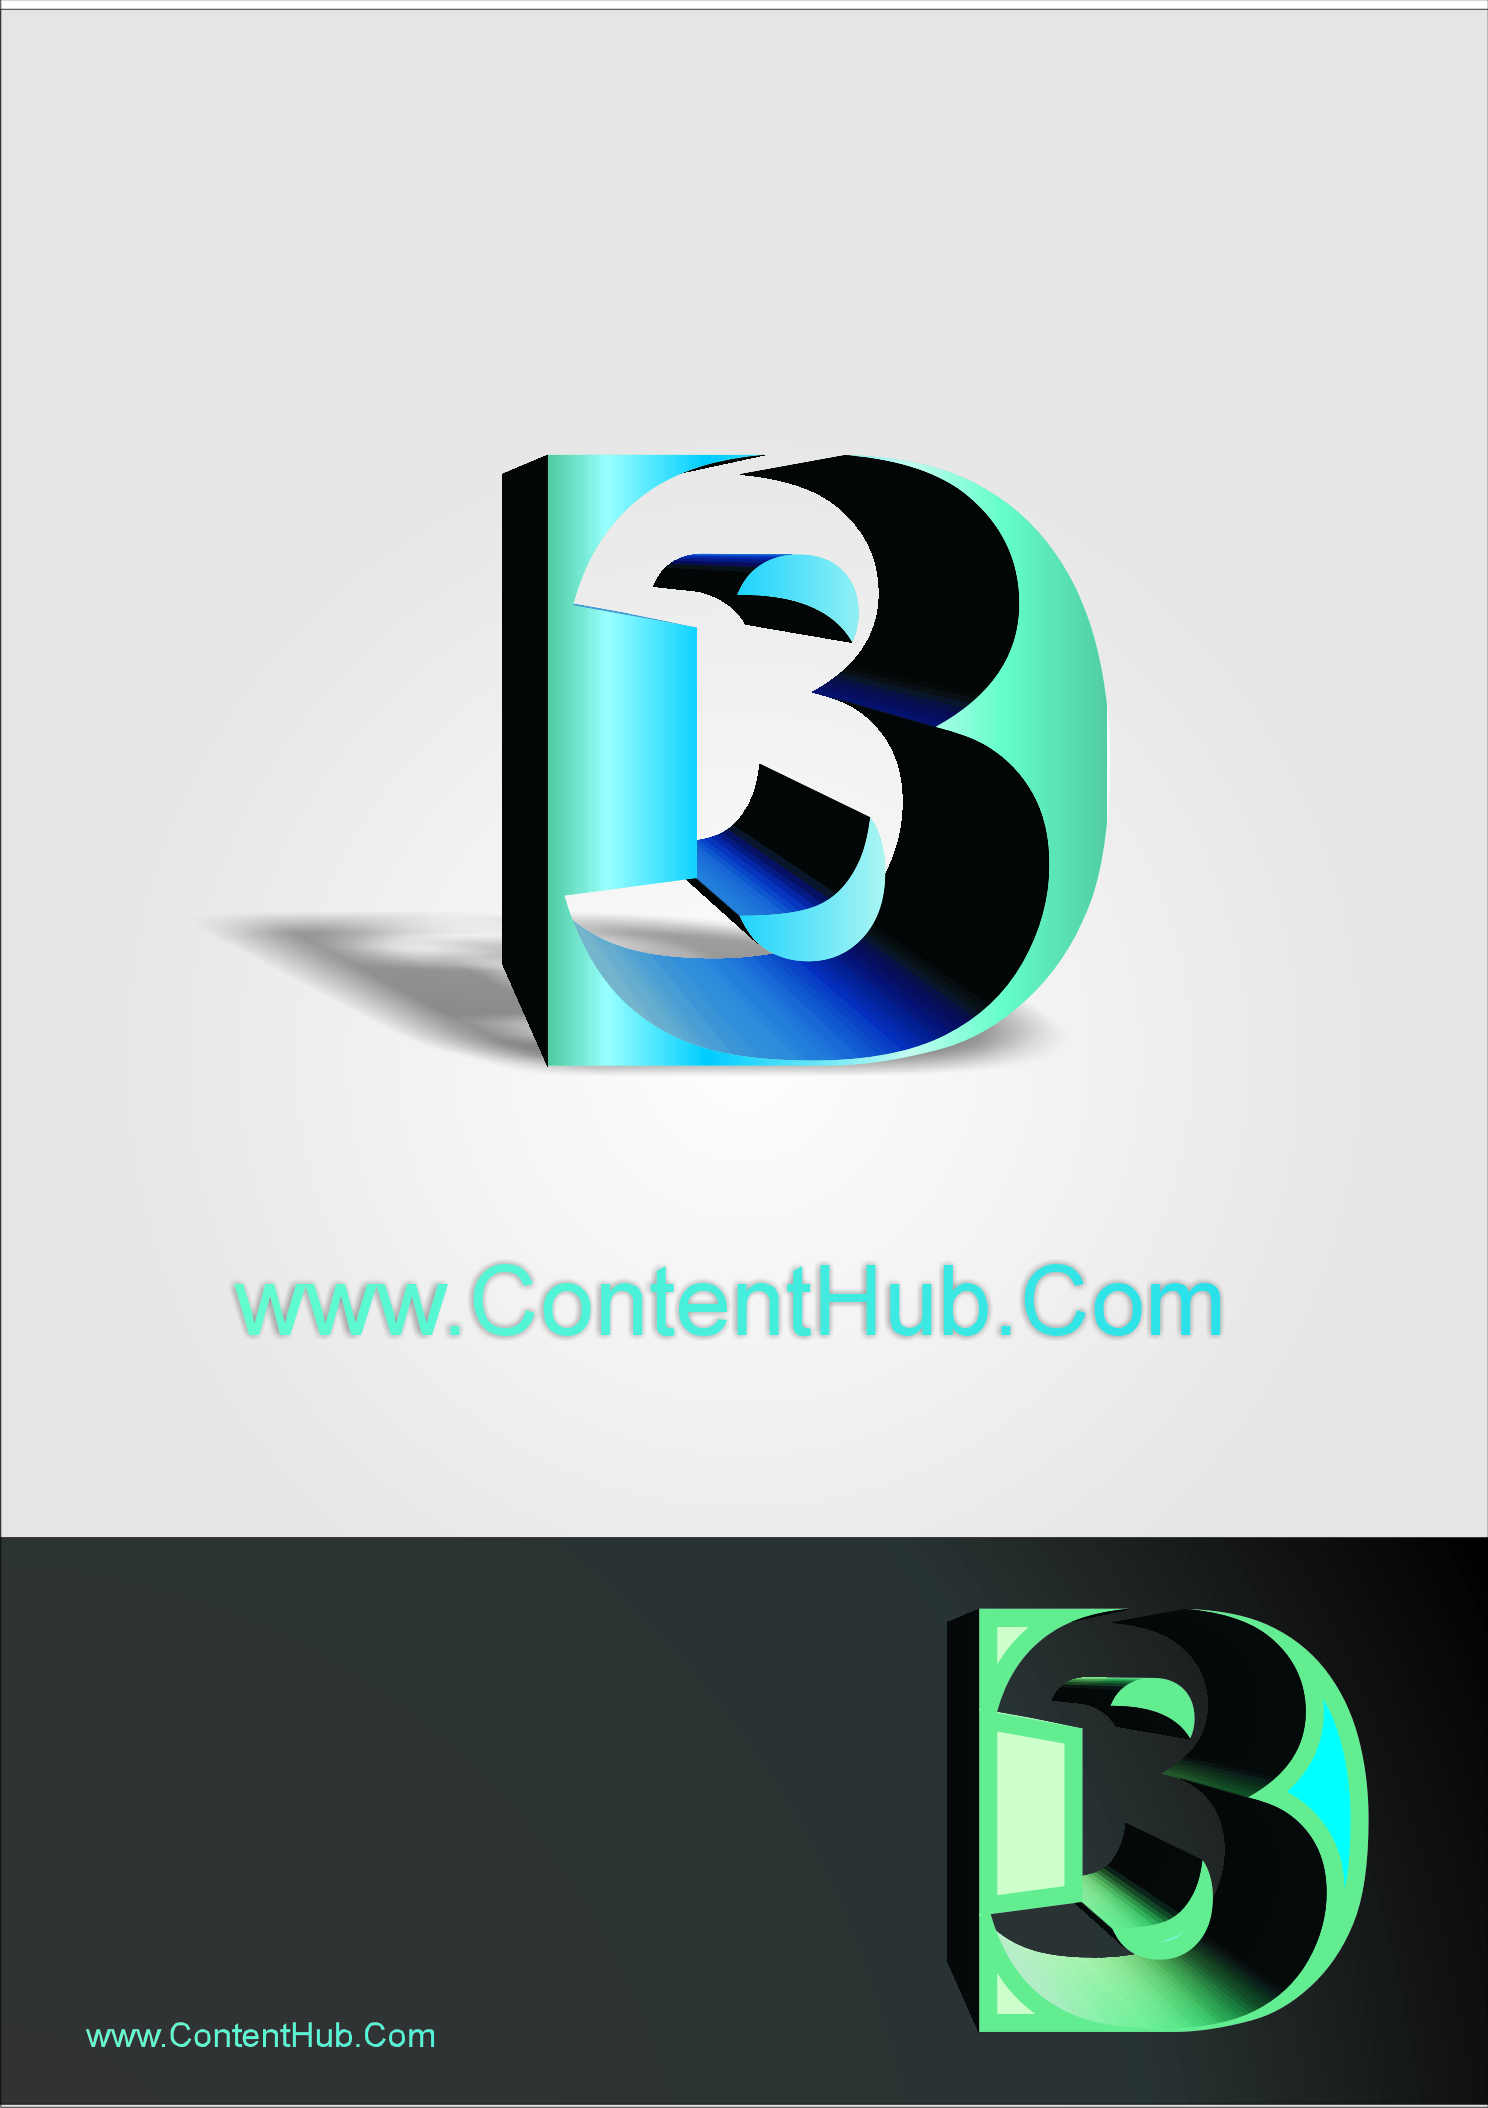 Logo Design by dimitrovart - Entry No. 24 in the Logo Design Contest Unique Logo Design Wanted for 3DContentHub (.com).